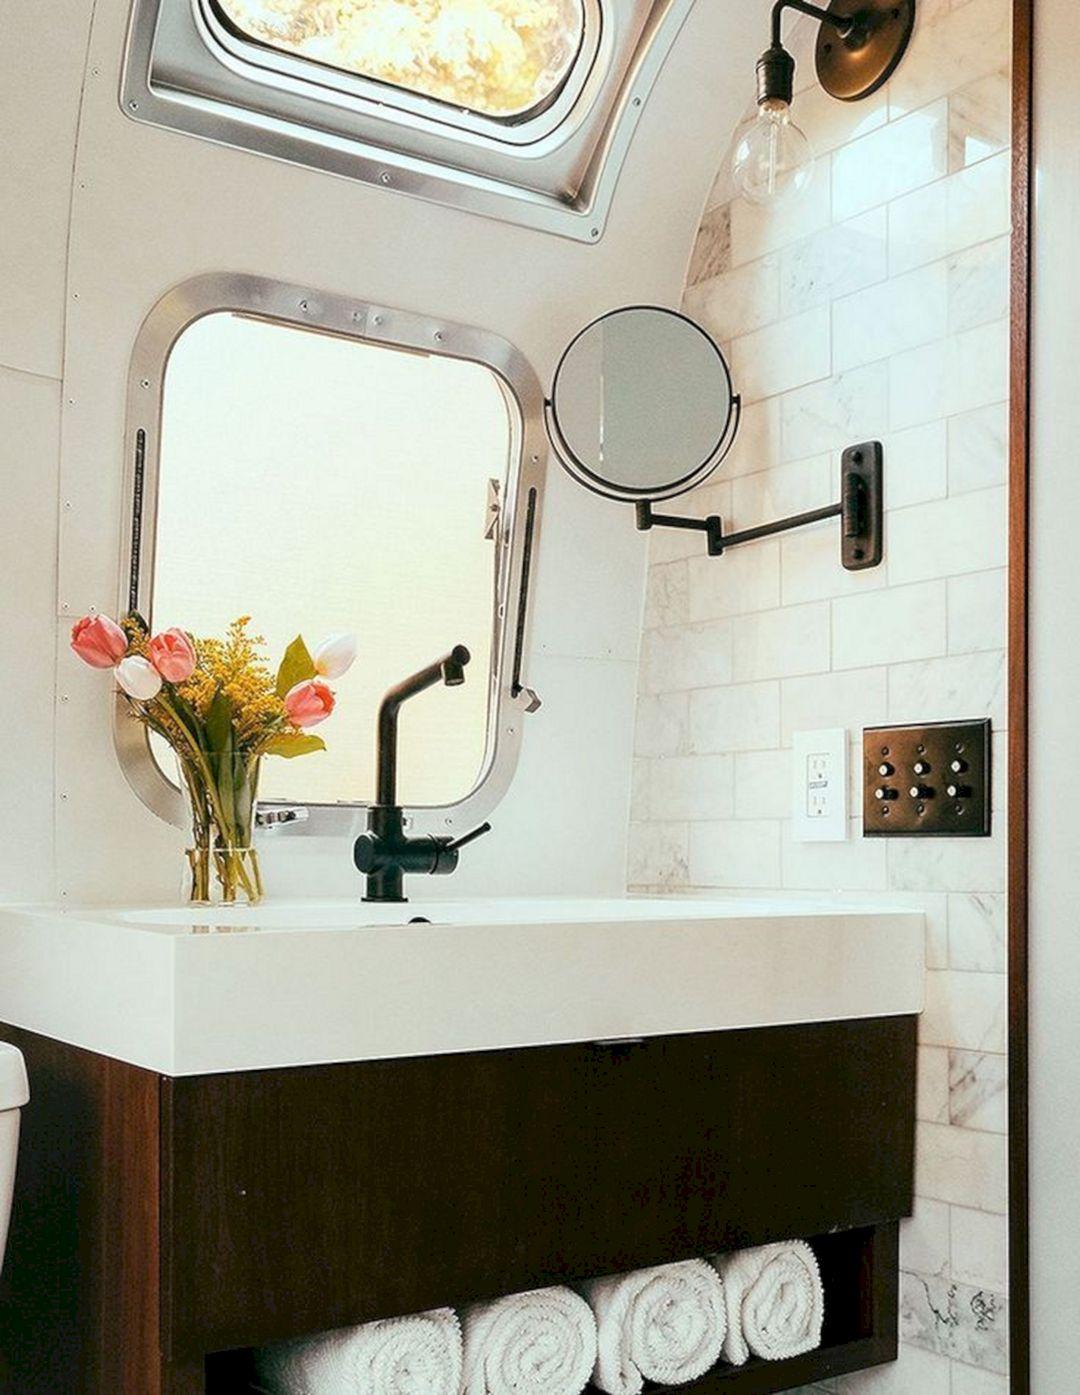 Modern RV Bathroom Design